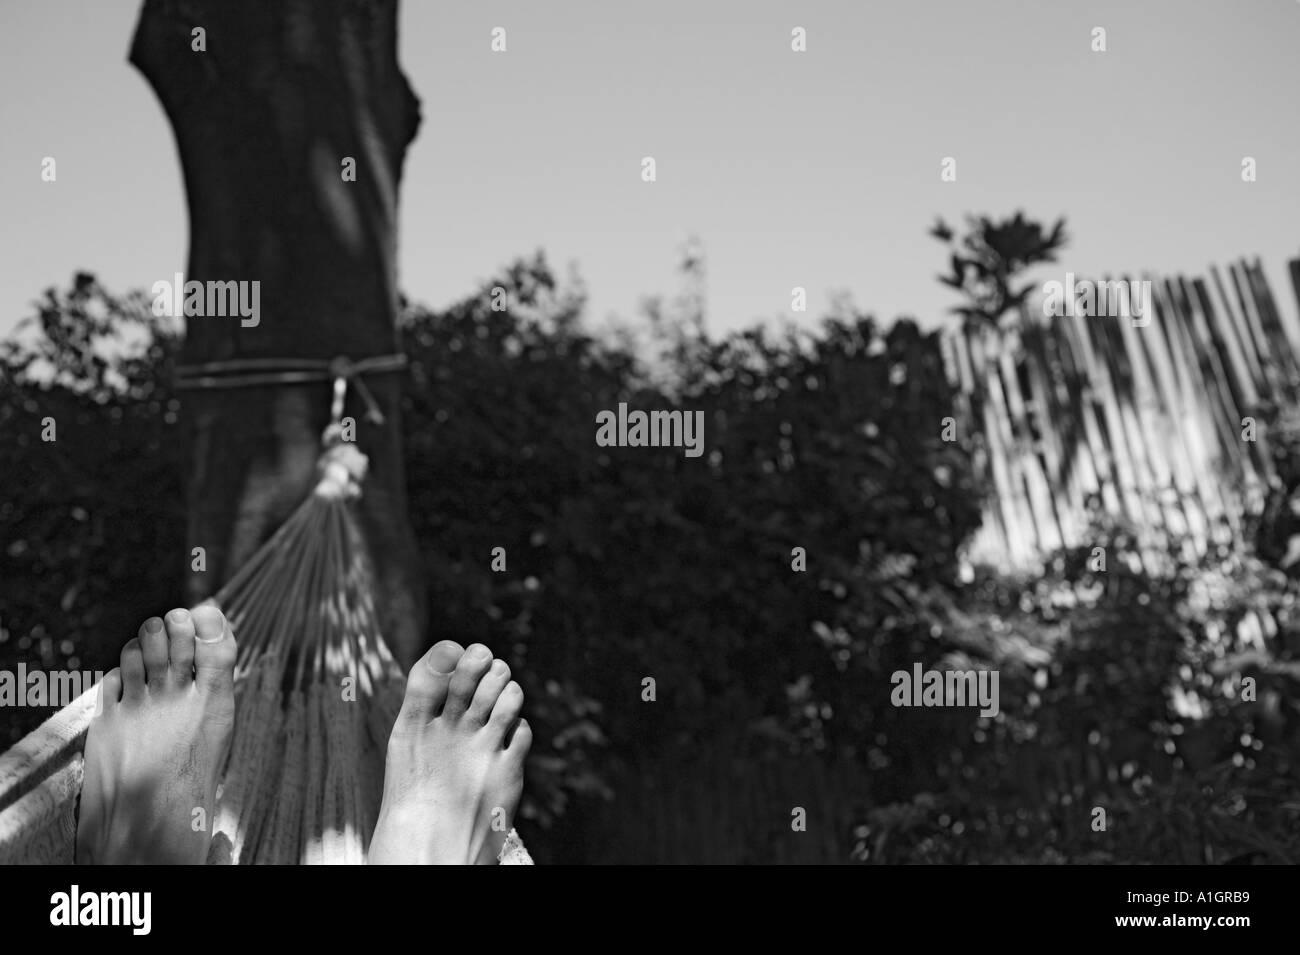 Feet Of Man Resting In Hammock - Stock Image